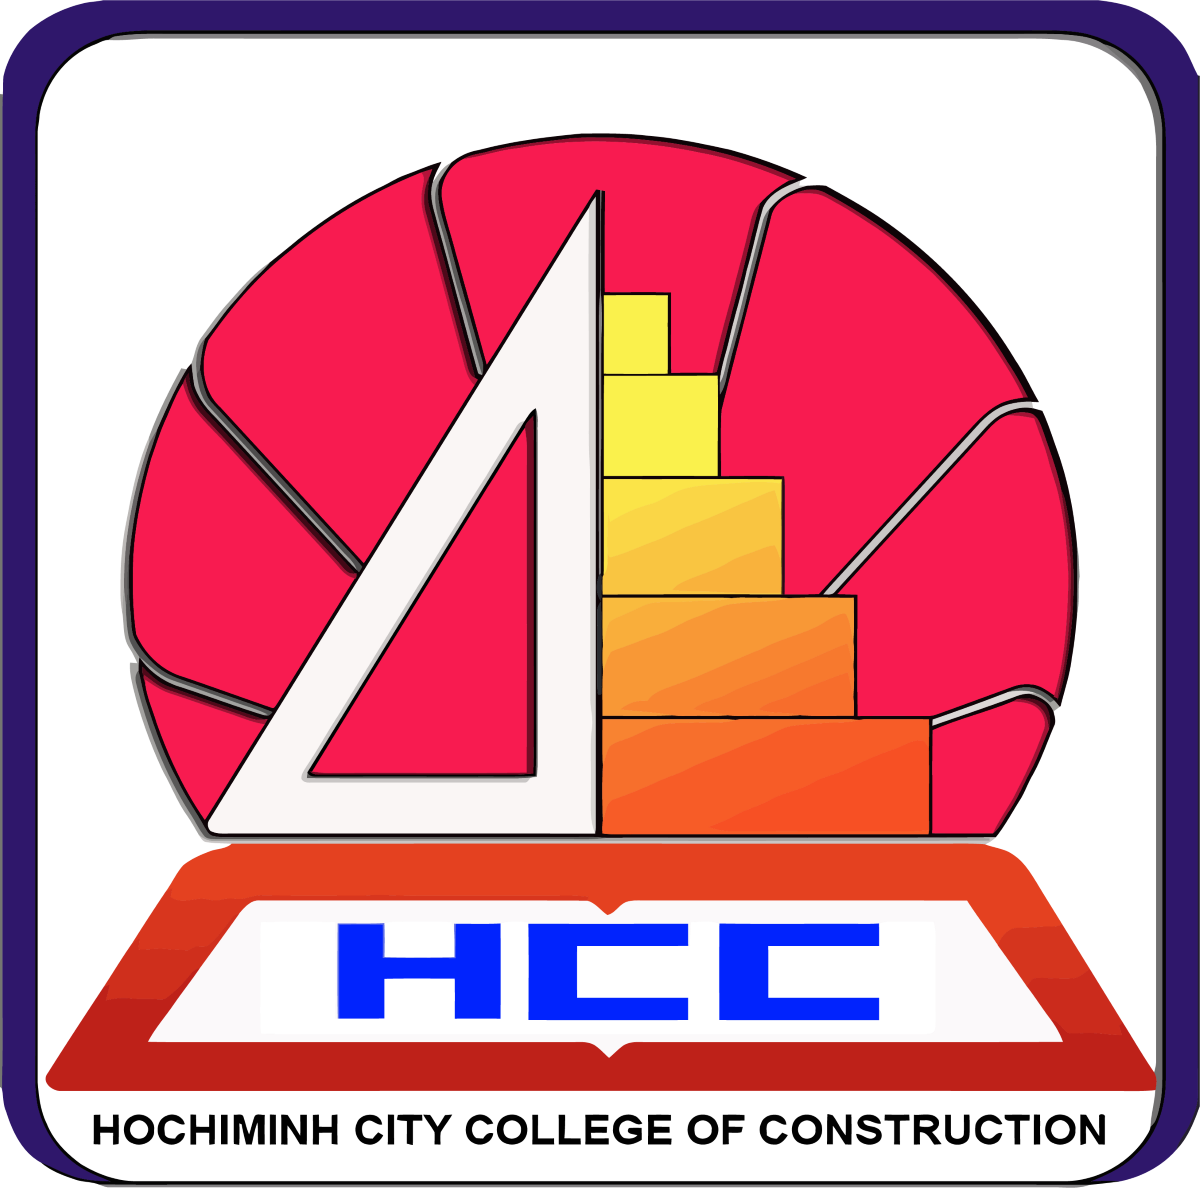 Logo CD Xay Dung TpHCM